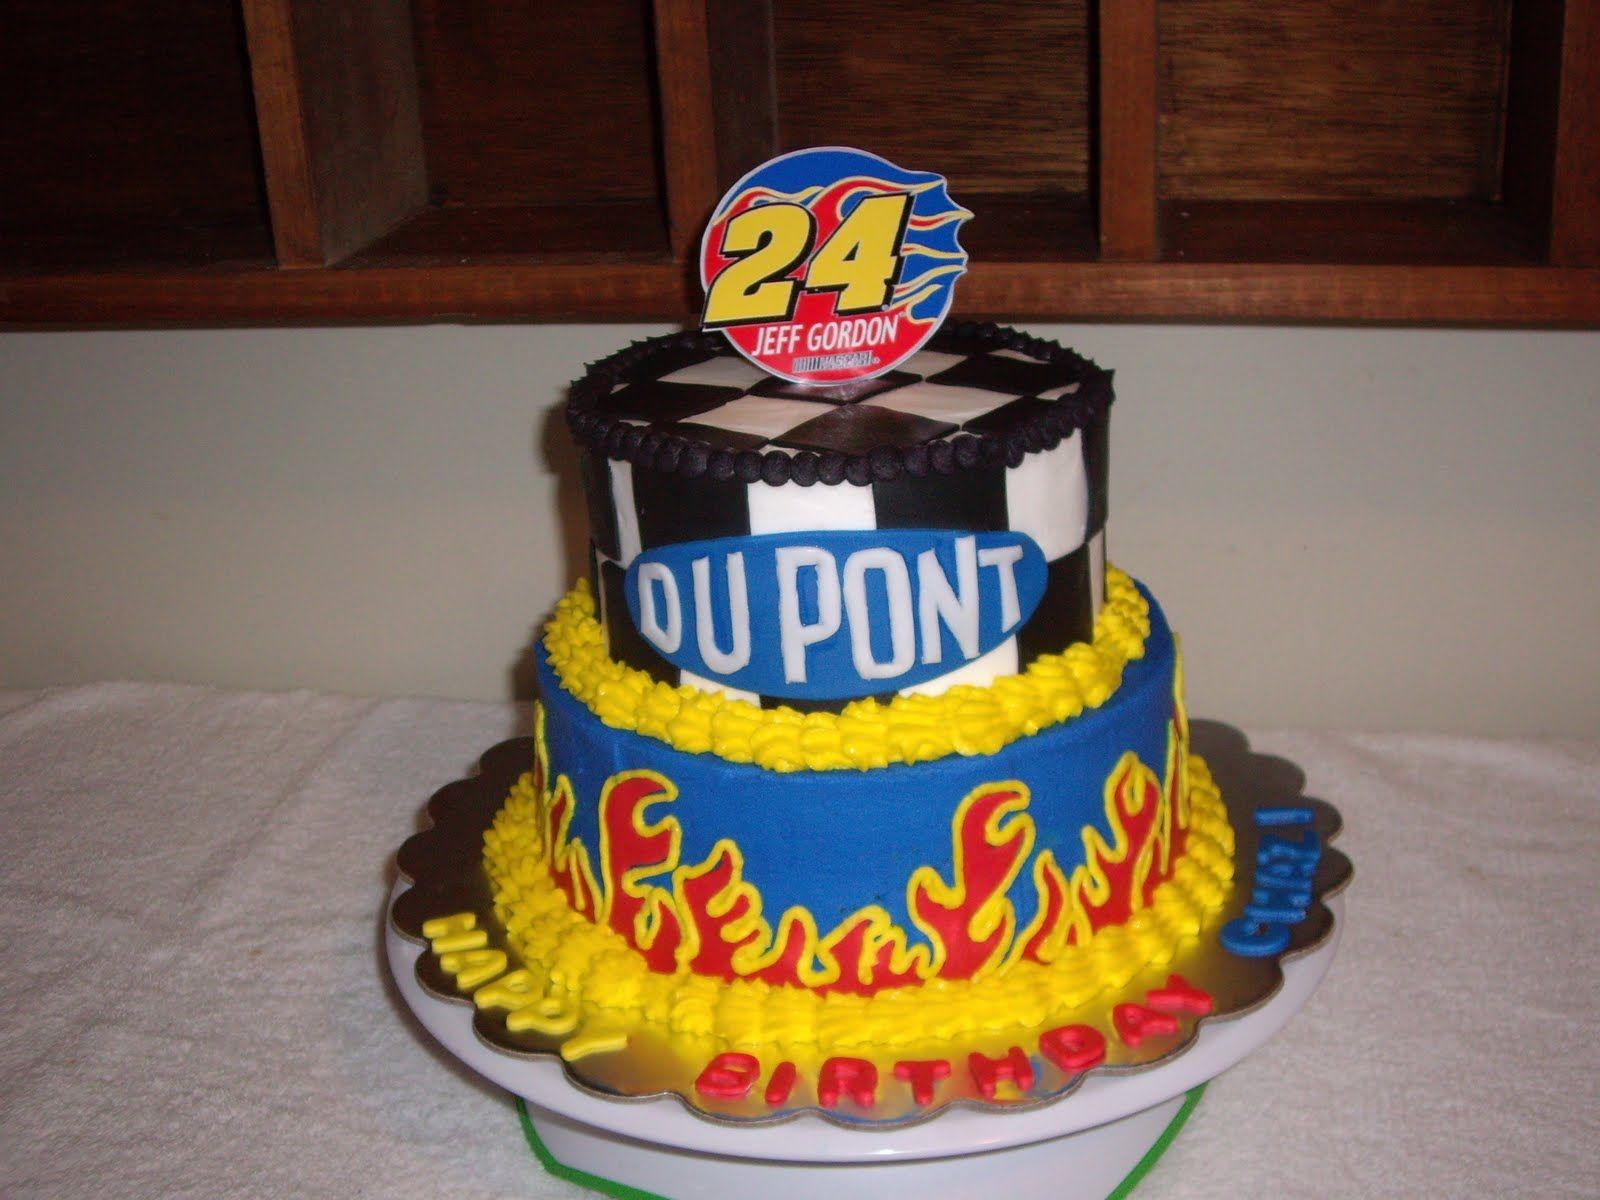 Jeff Gordon Nascar Birthday Cake With Images Cake Birthday